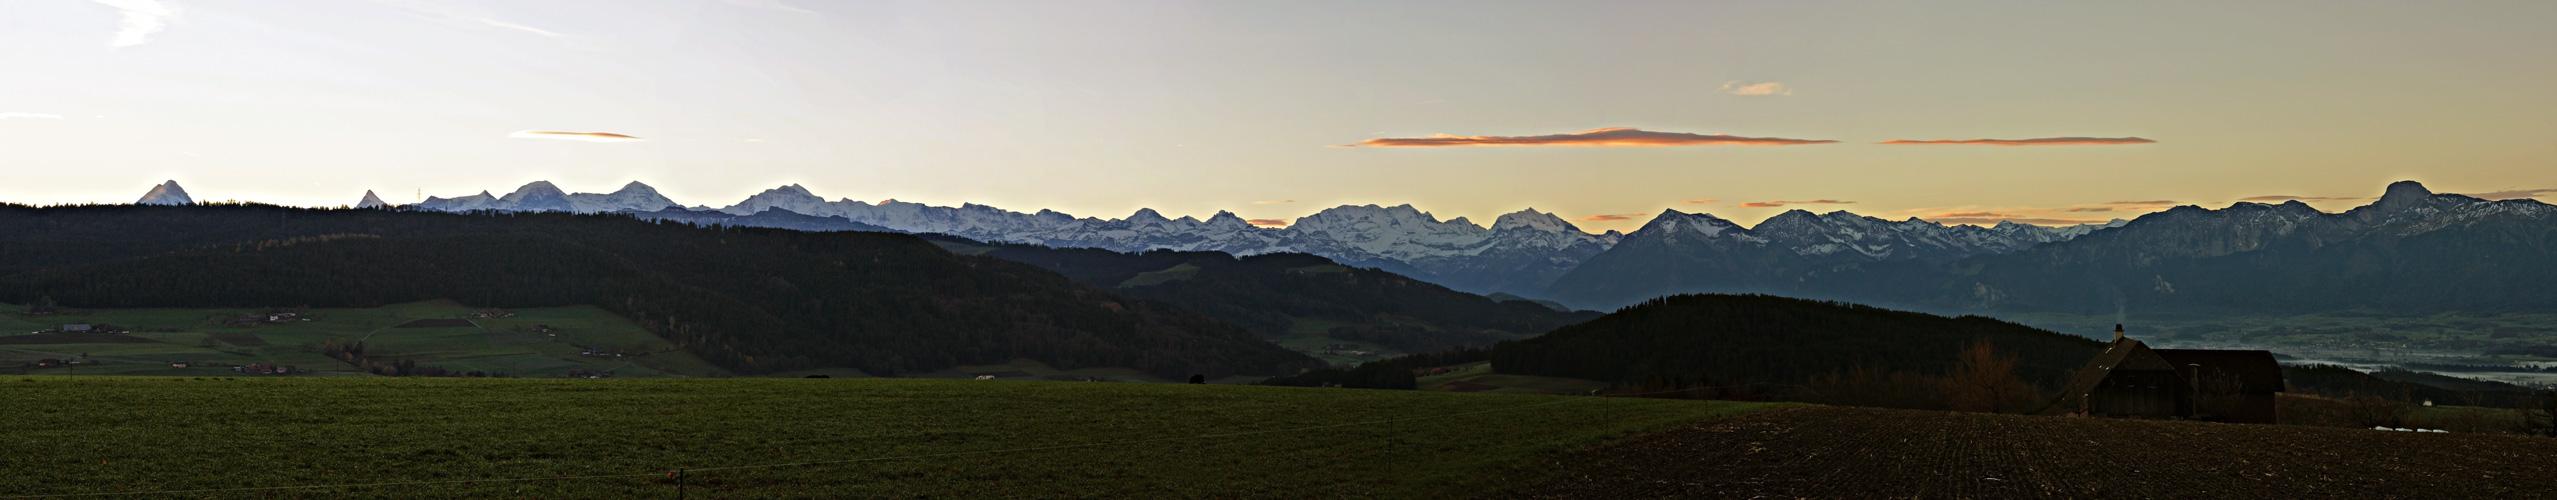 Alpenpanorama vor dem Sonnenaufgang